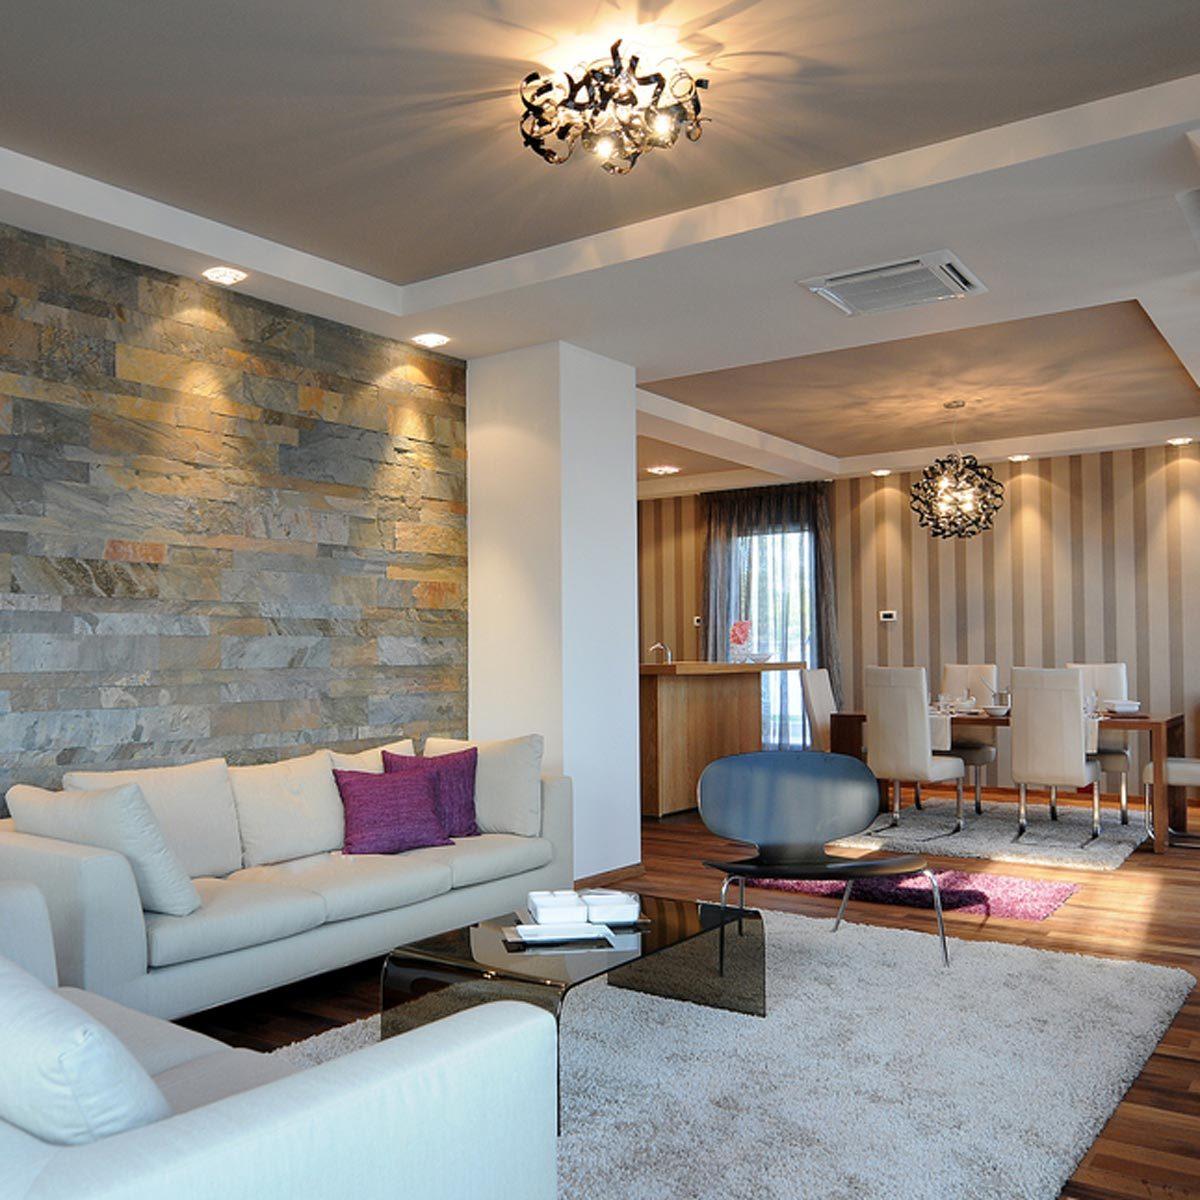 Interior Design Tips: Layer Lighting